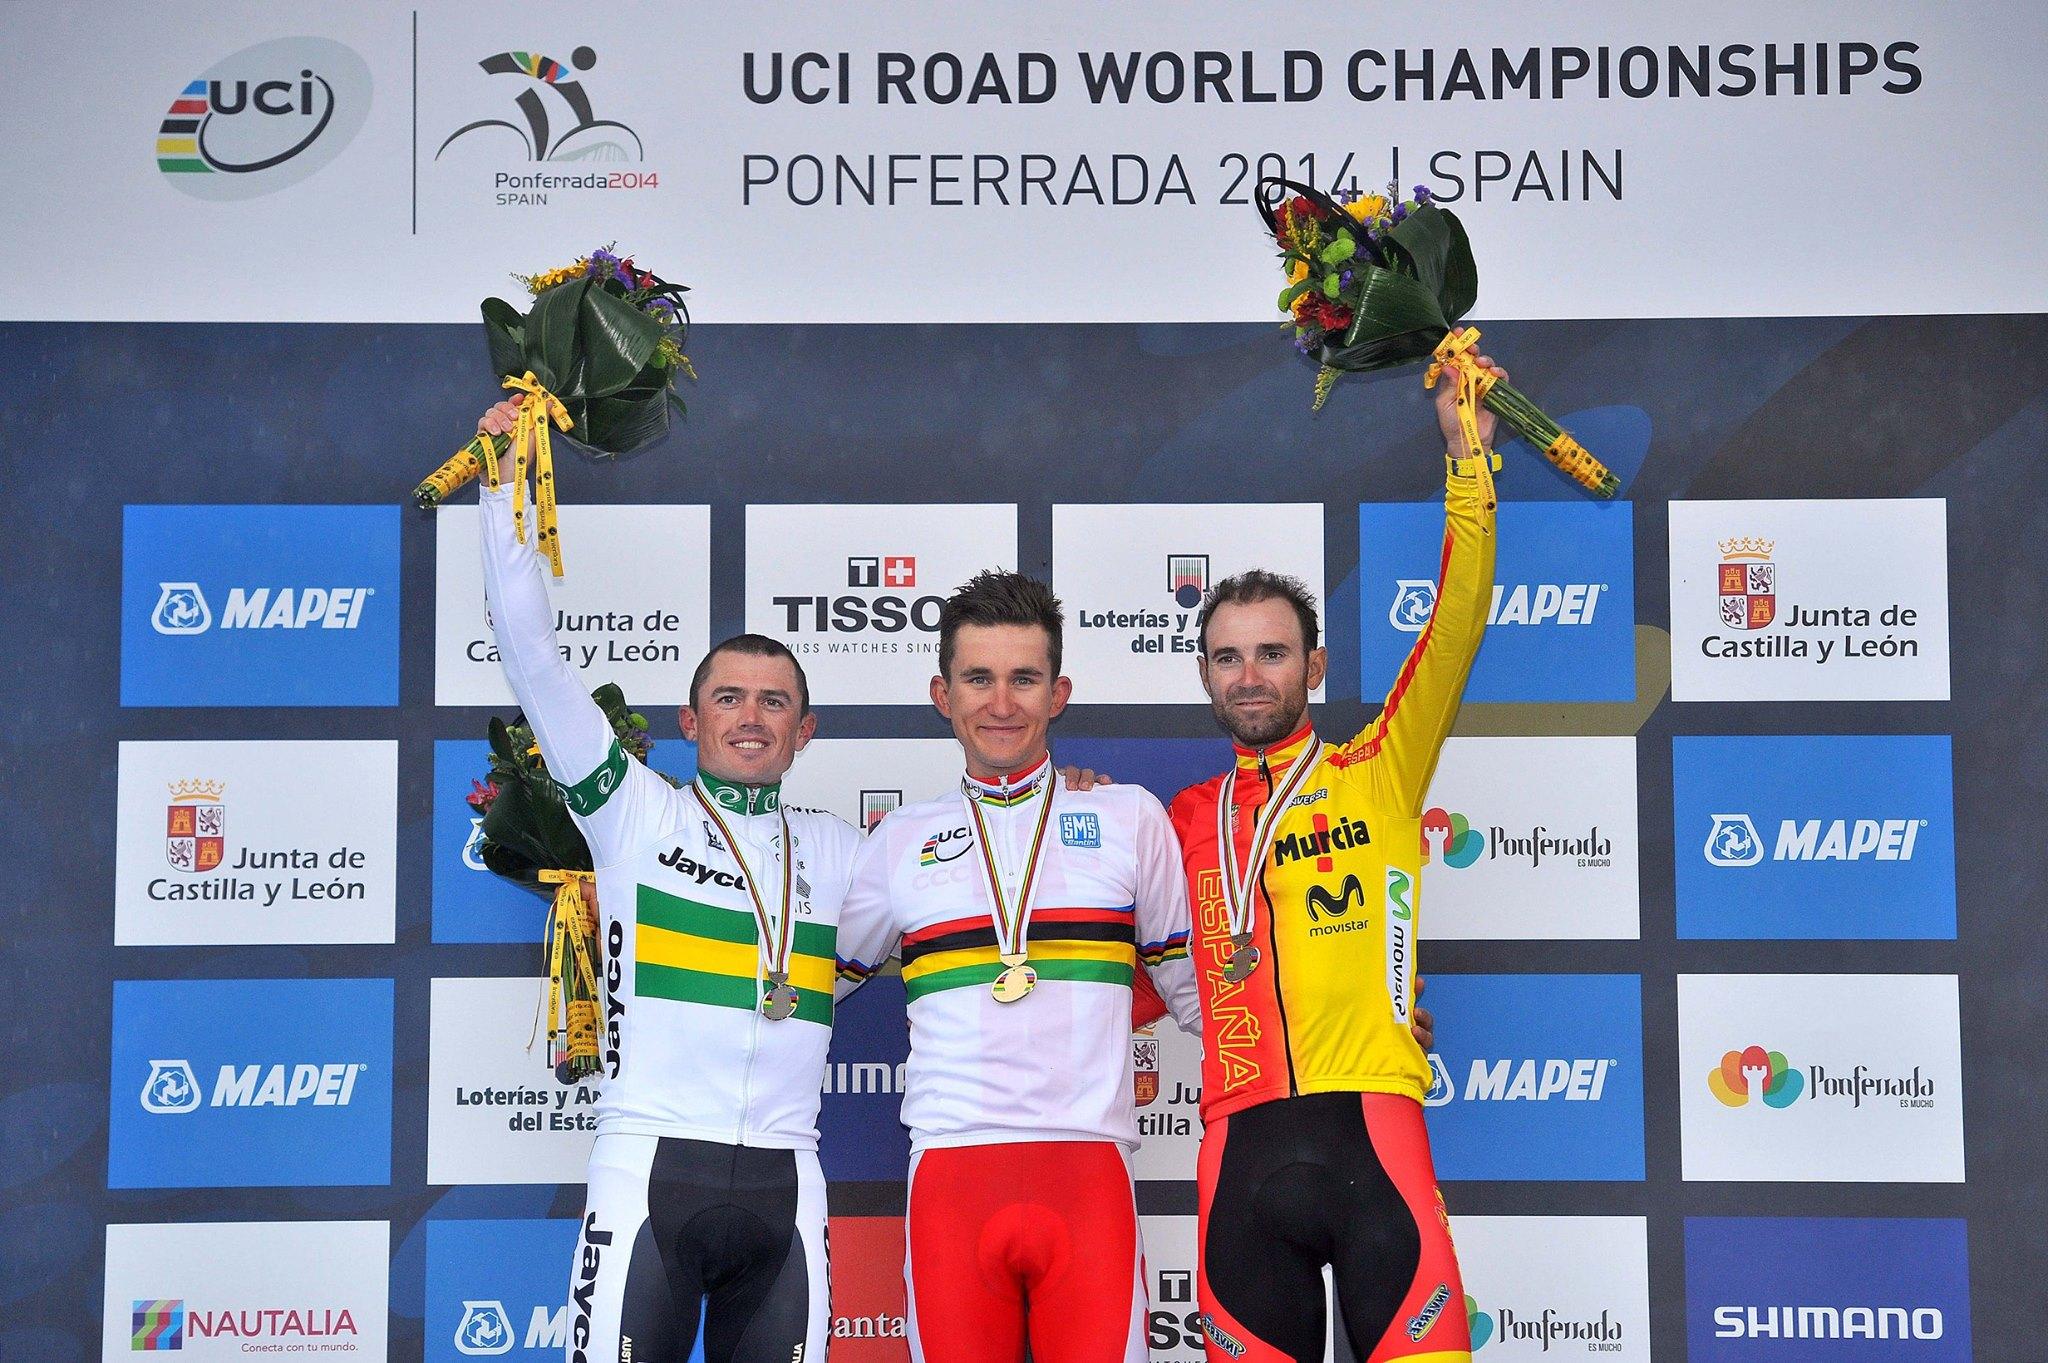 Simon Gerrans (Australia); Michal Kwiatkowski (Poland); Alejandro Valverde Belmonte (Spain)